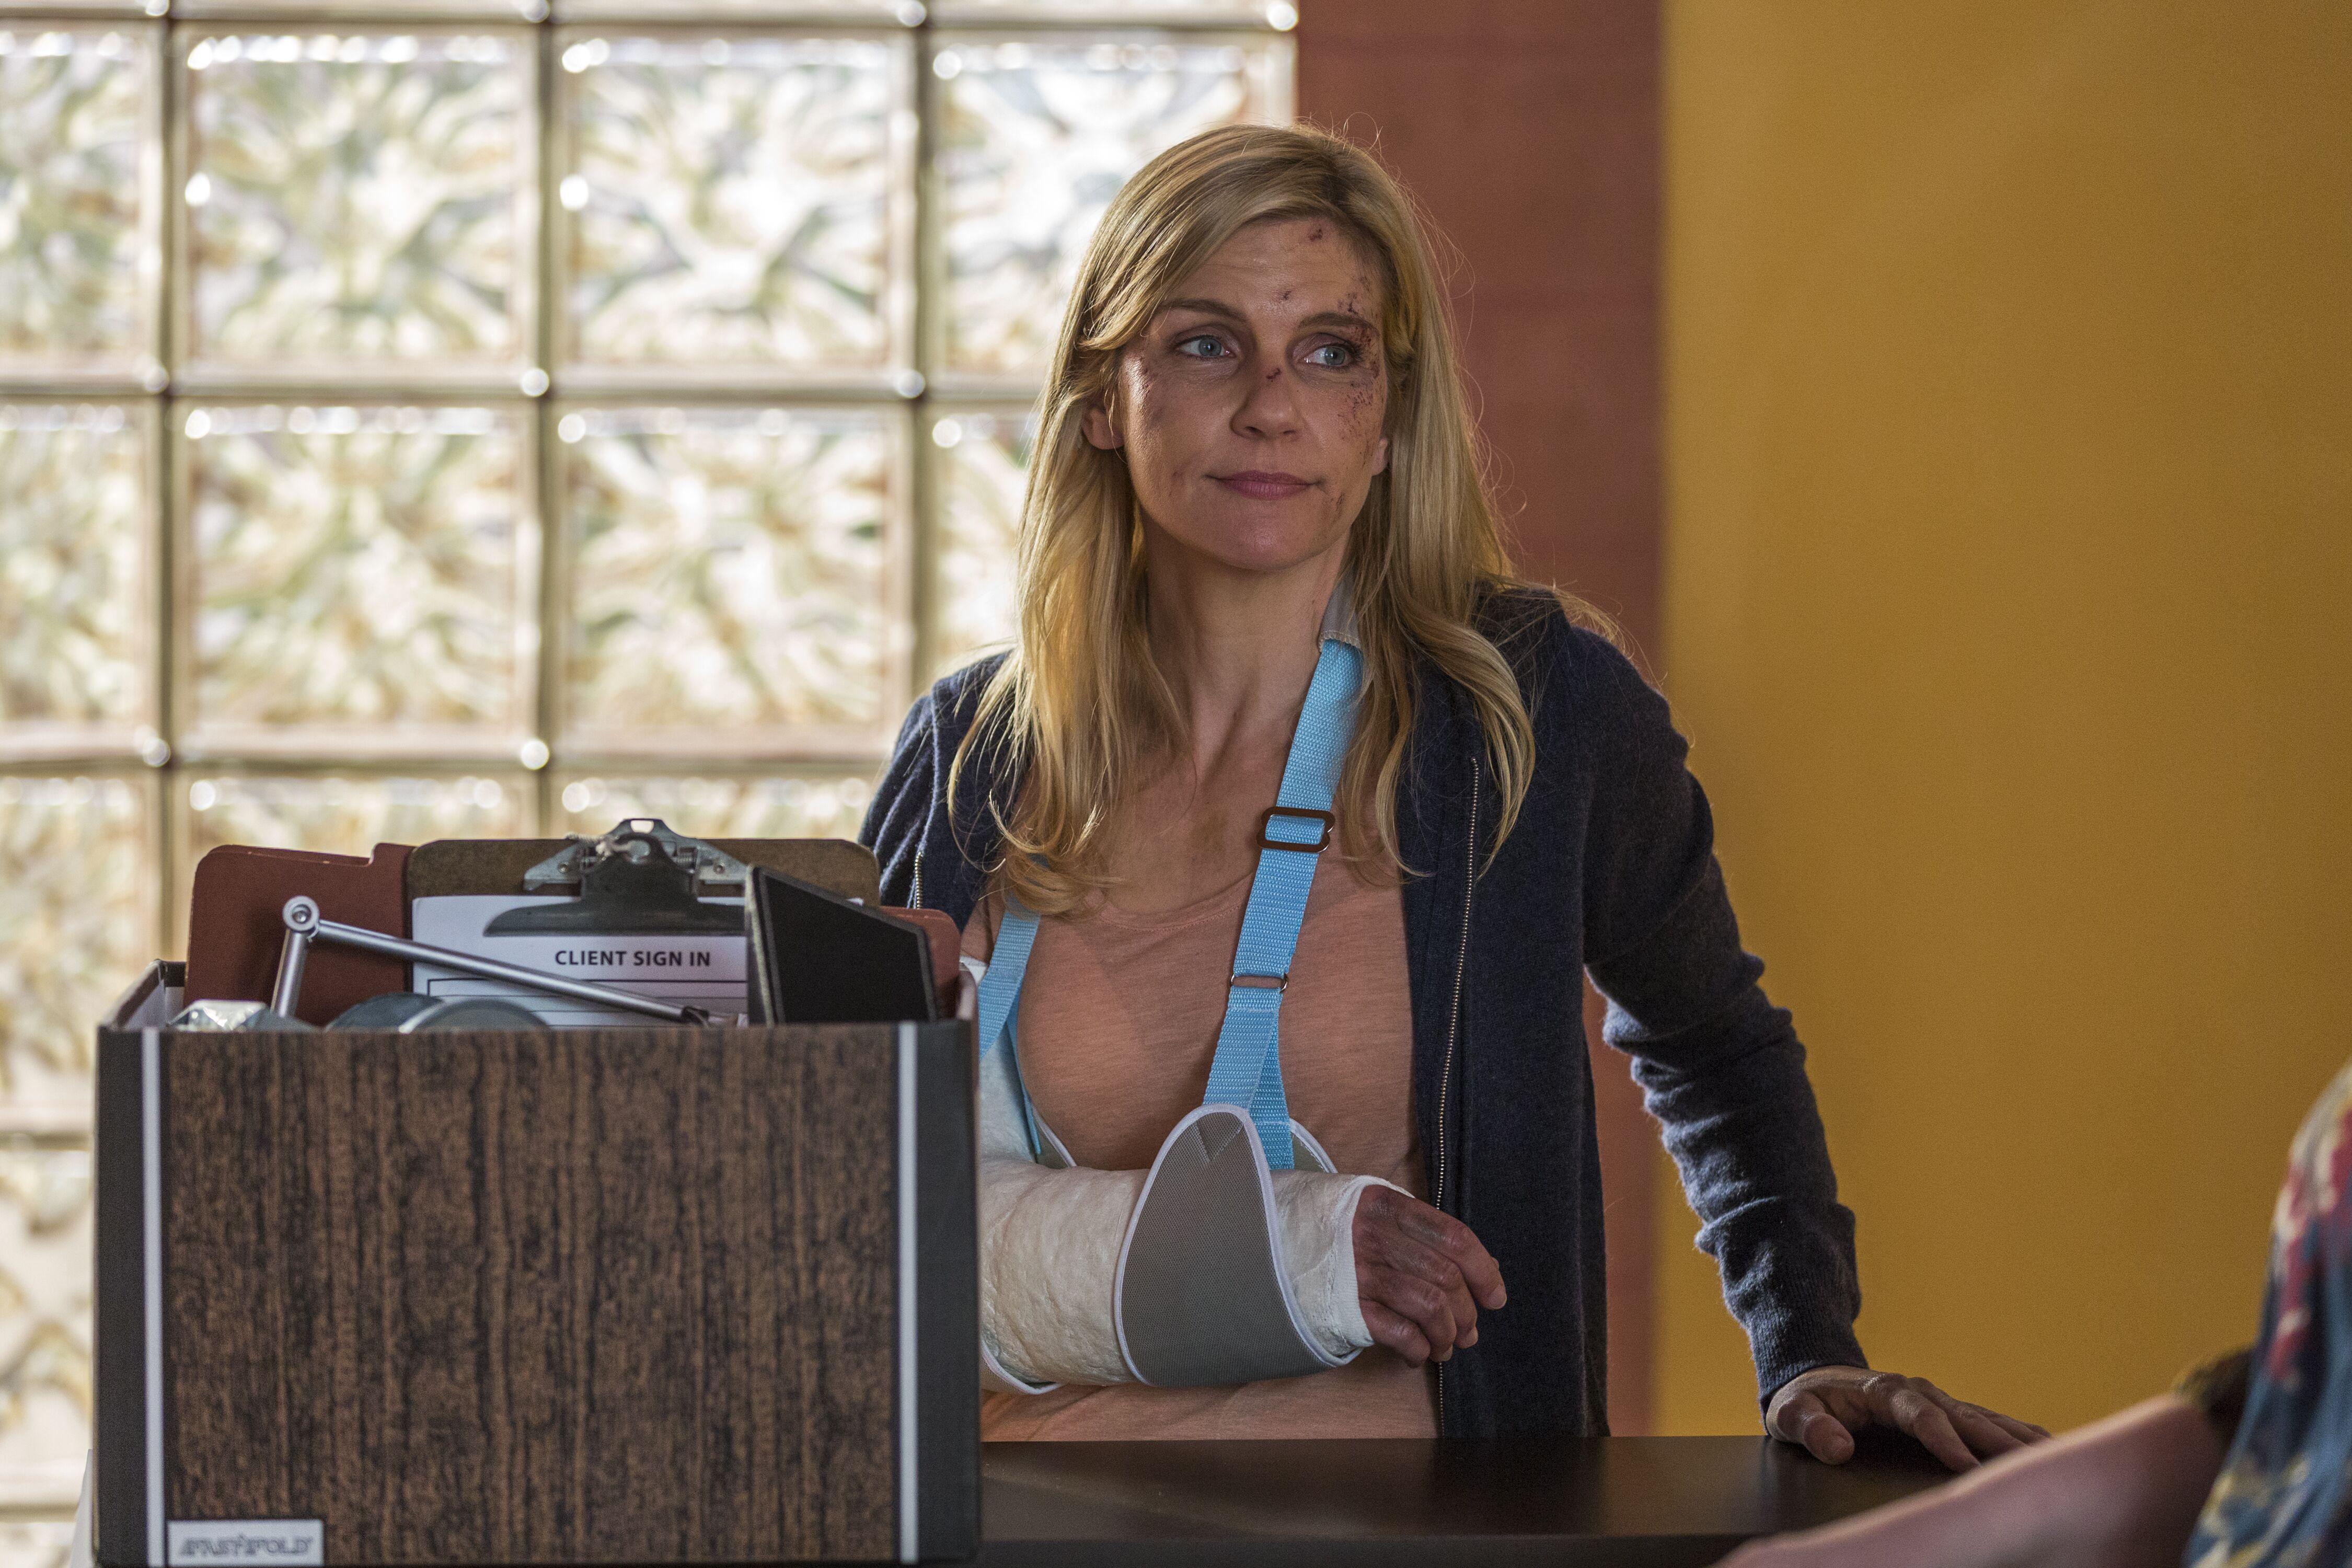 Is Kim Wexler of AMC's Better Call Saul breaking bad?